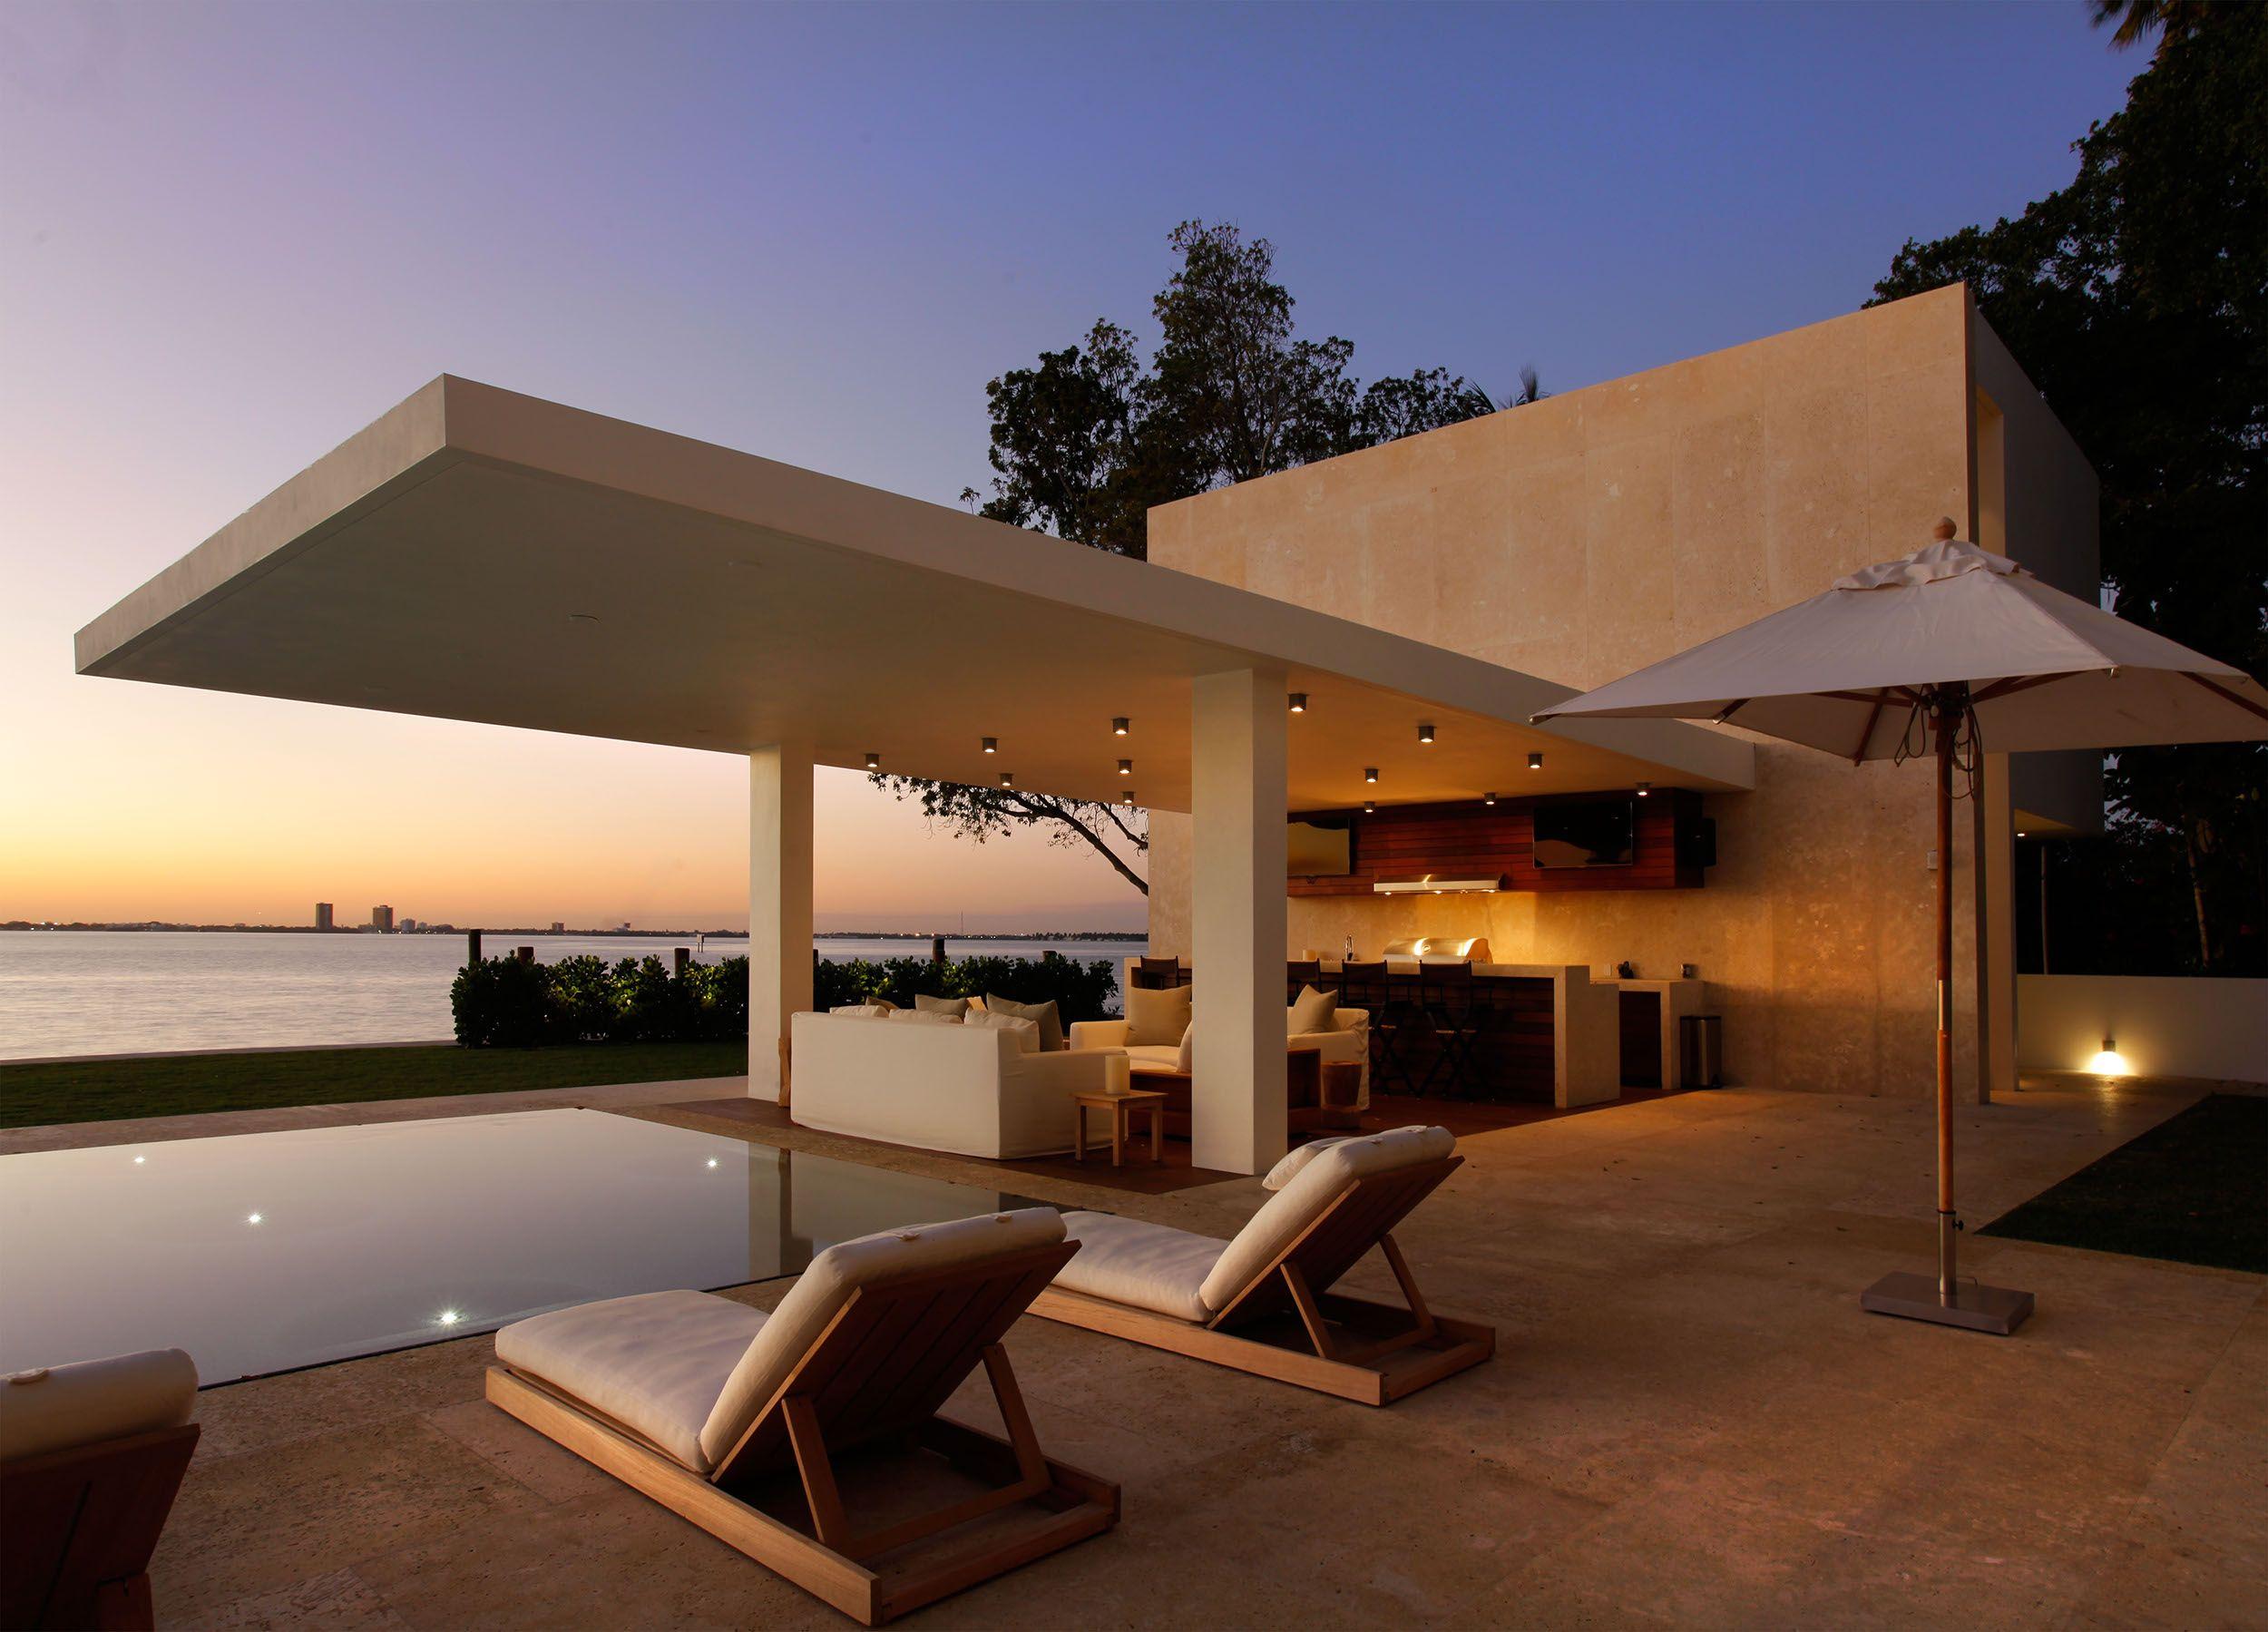 North Miami Beach Residence Opustone Natural Stone Interior Design Pool Patio Miami With Images Modern Outdoor Kitchen Outdoor Kitchen Design Residences